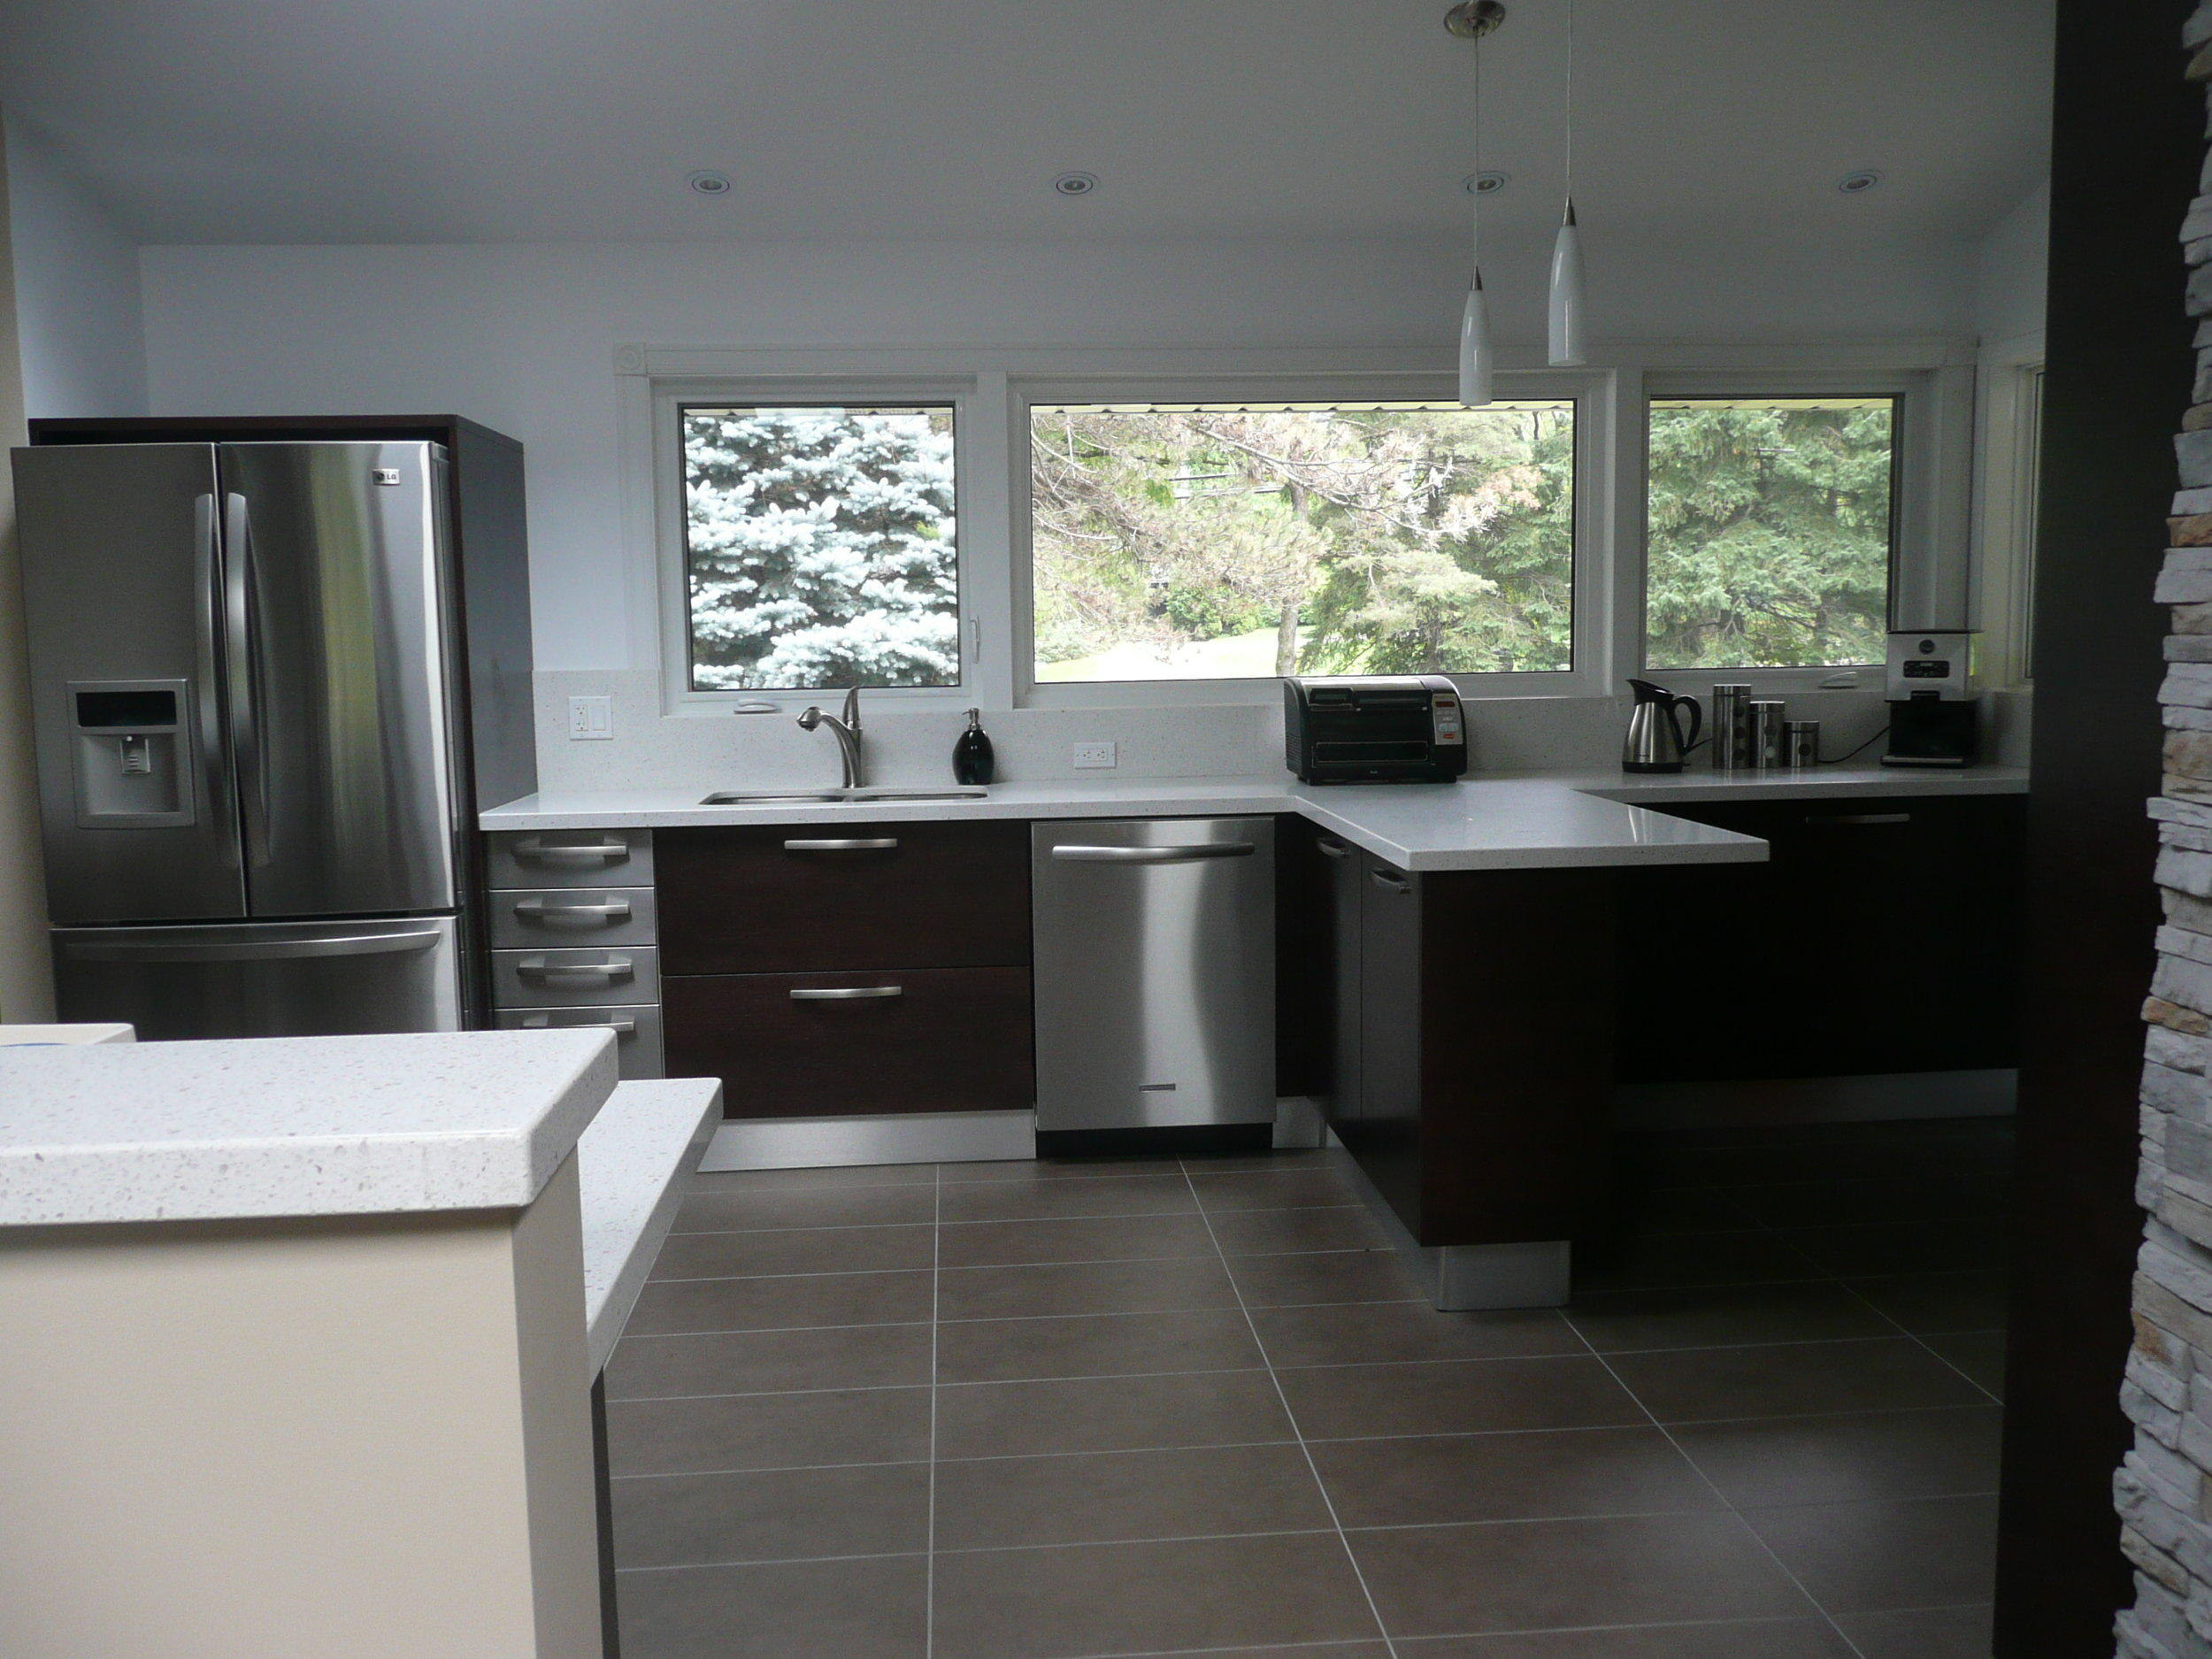 Kitchen 15 Pic 2.JPG